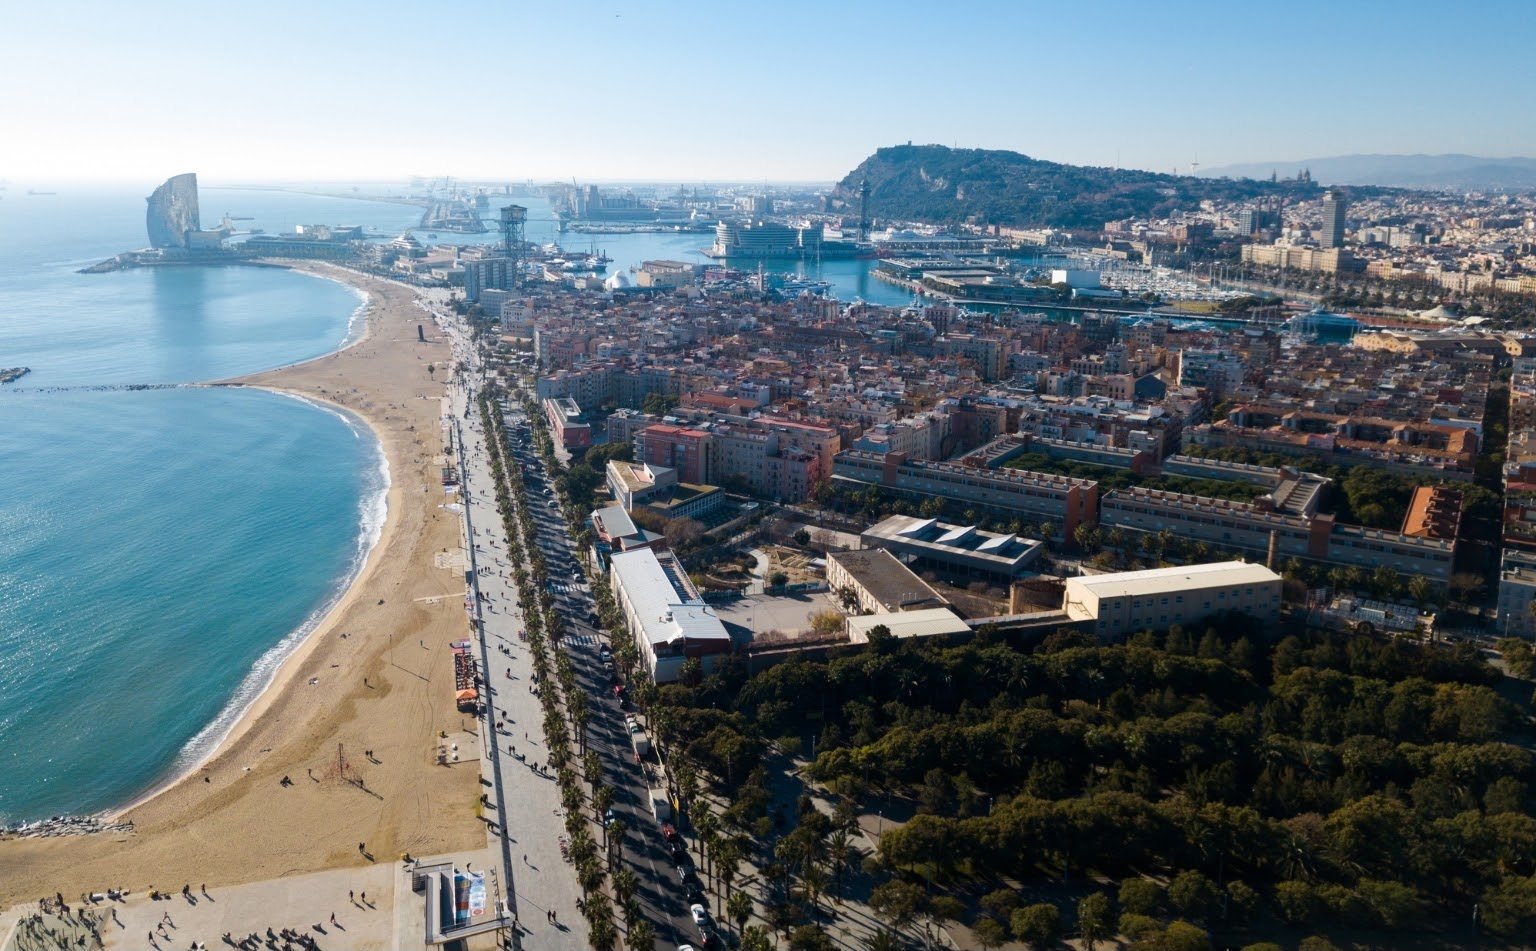 Barceloneta wasn't always there